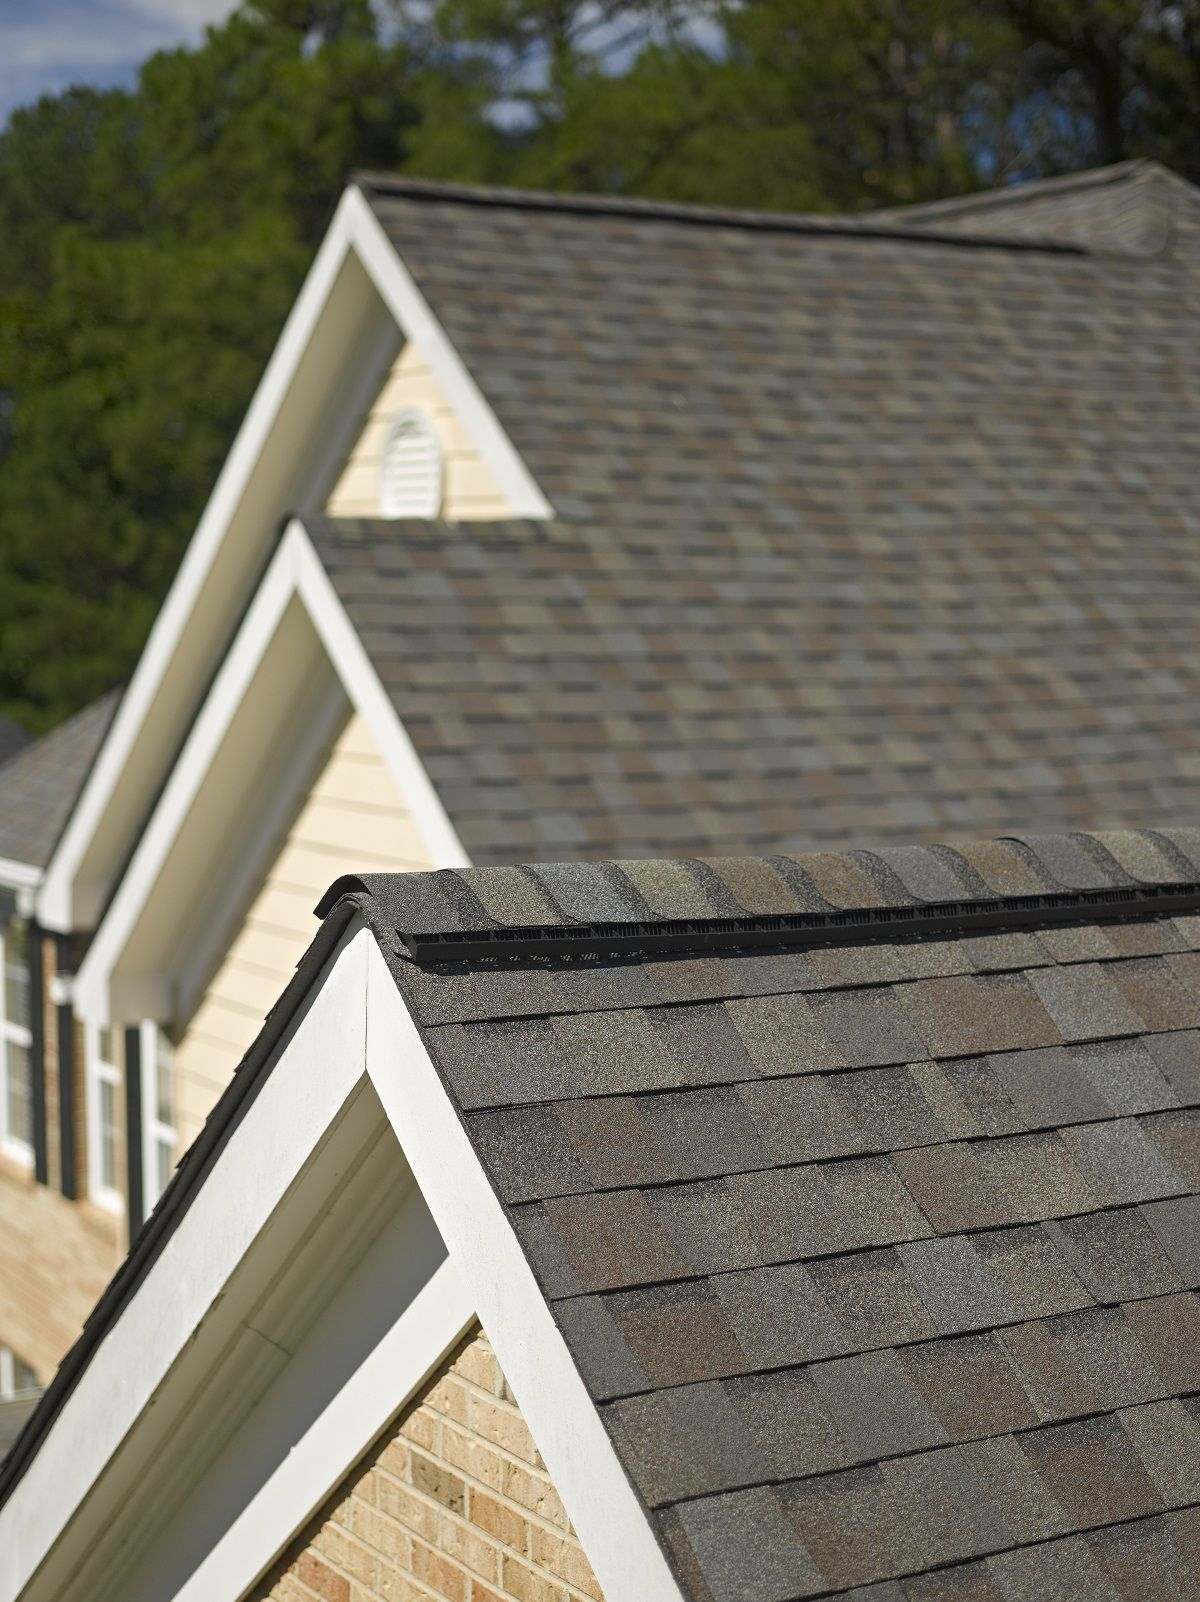 home depot shingles on certainteed landmark shingle in driftwood residentialroofing architectural shingles residential roofing roof shingles certainteed landmark shingle in